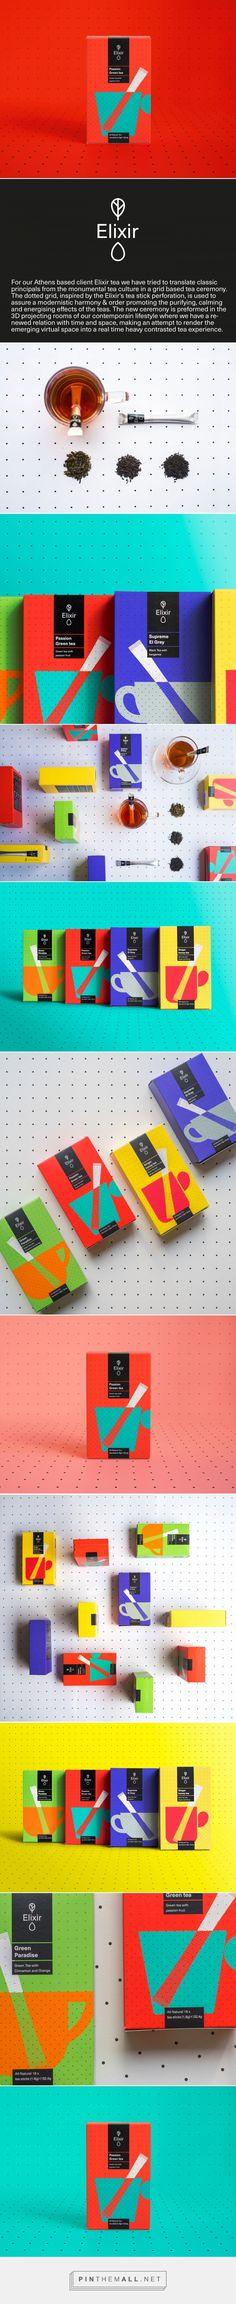 Elixir Tea Packaging by Typical Organization | Fivestar Branding Agency – Design and Branding Agency & Curated Inspiration Gallery  #tea #teapackaging #package #packagingdesign #packagedesign #packageinspiration #packaginginspiration #design #behance #pinterest #dribbble #fivestarbranding